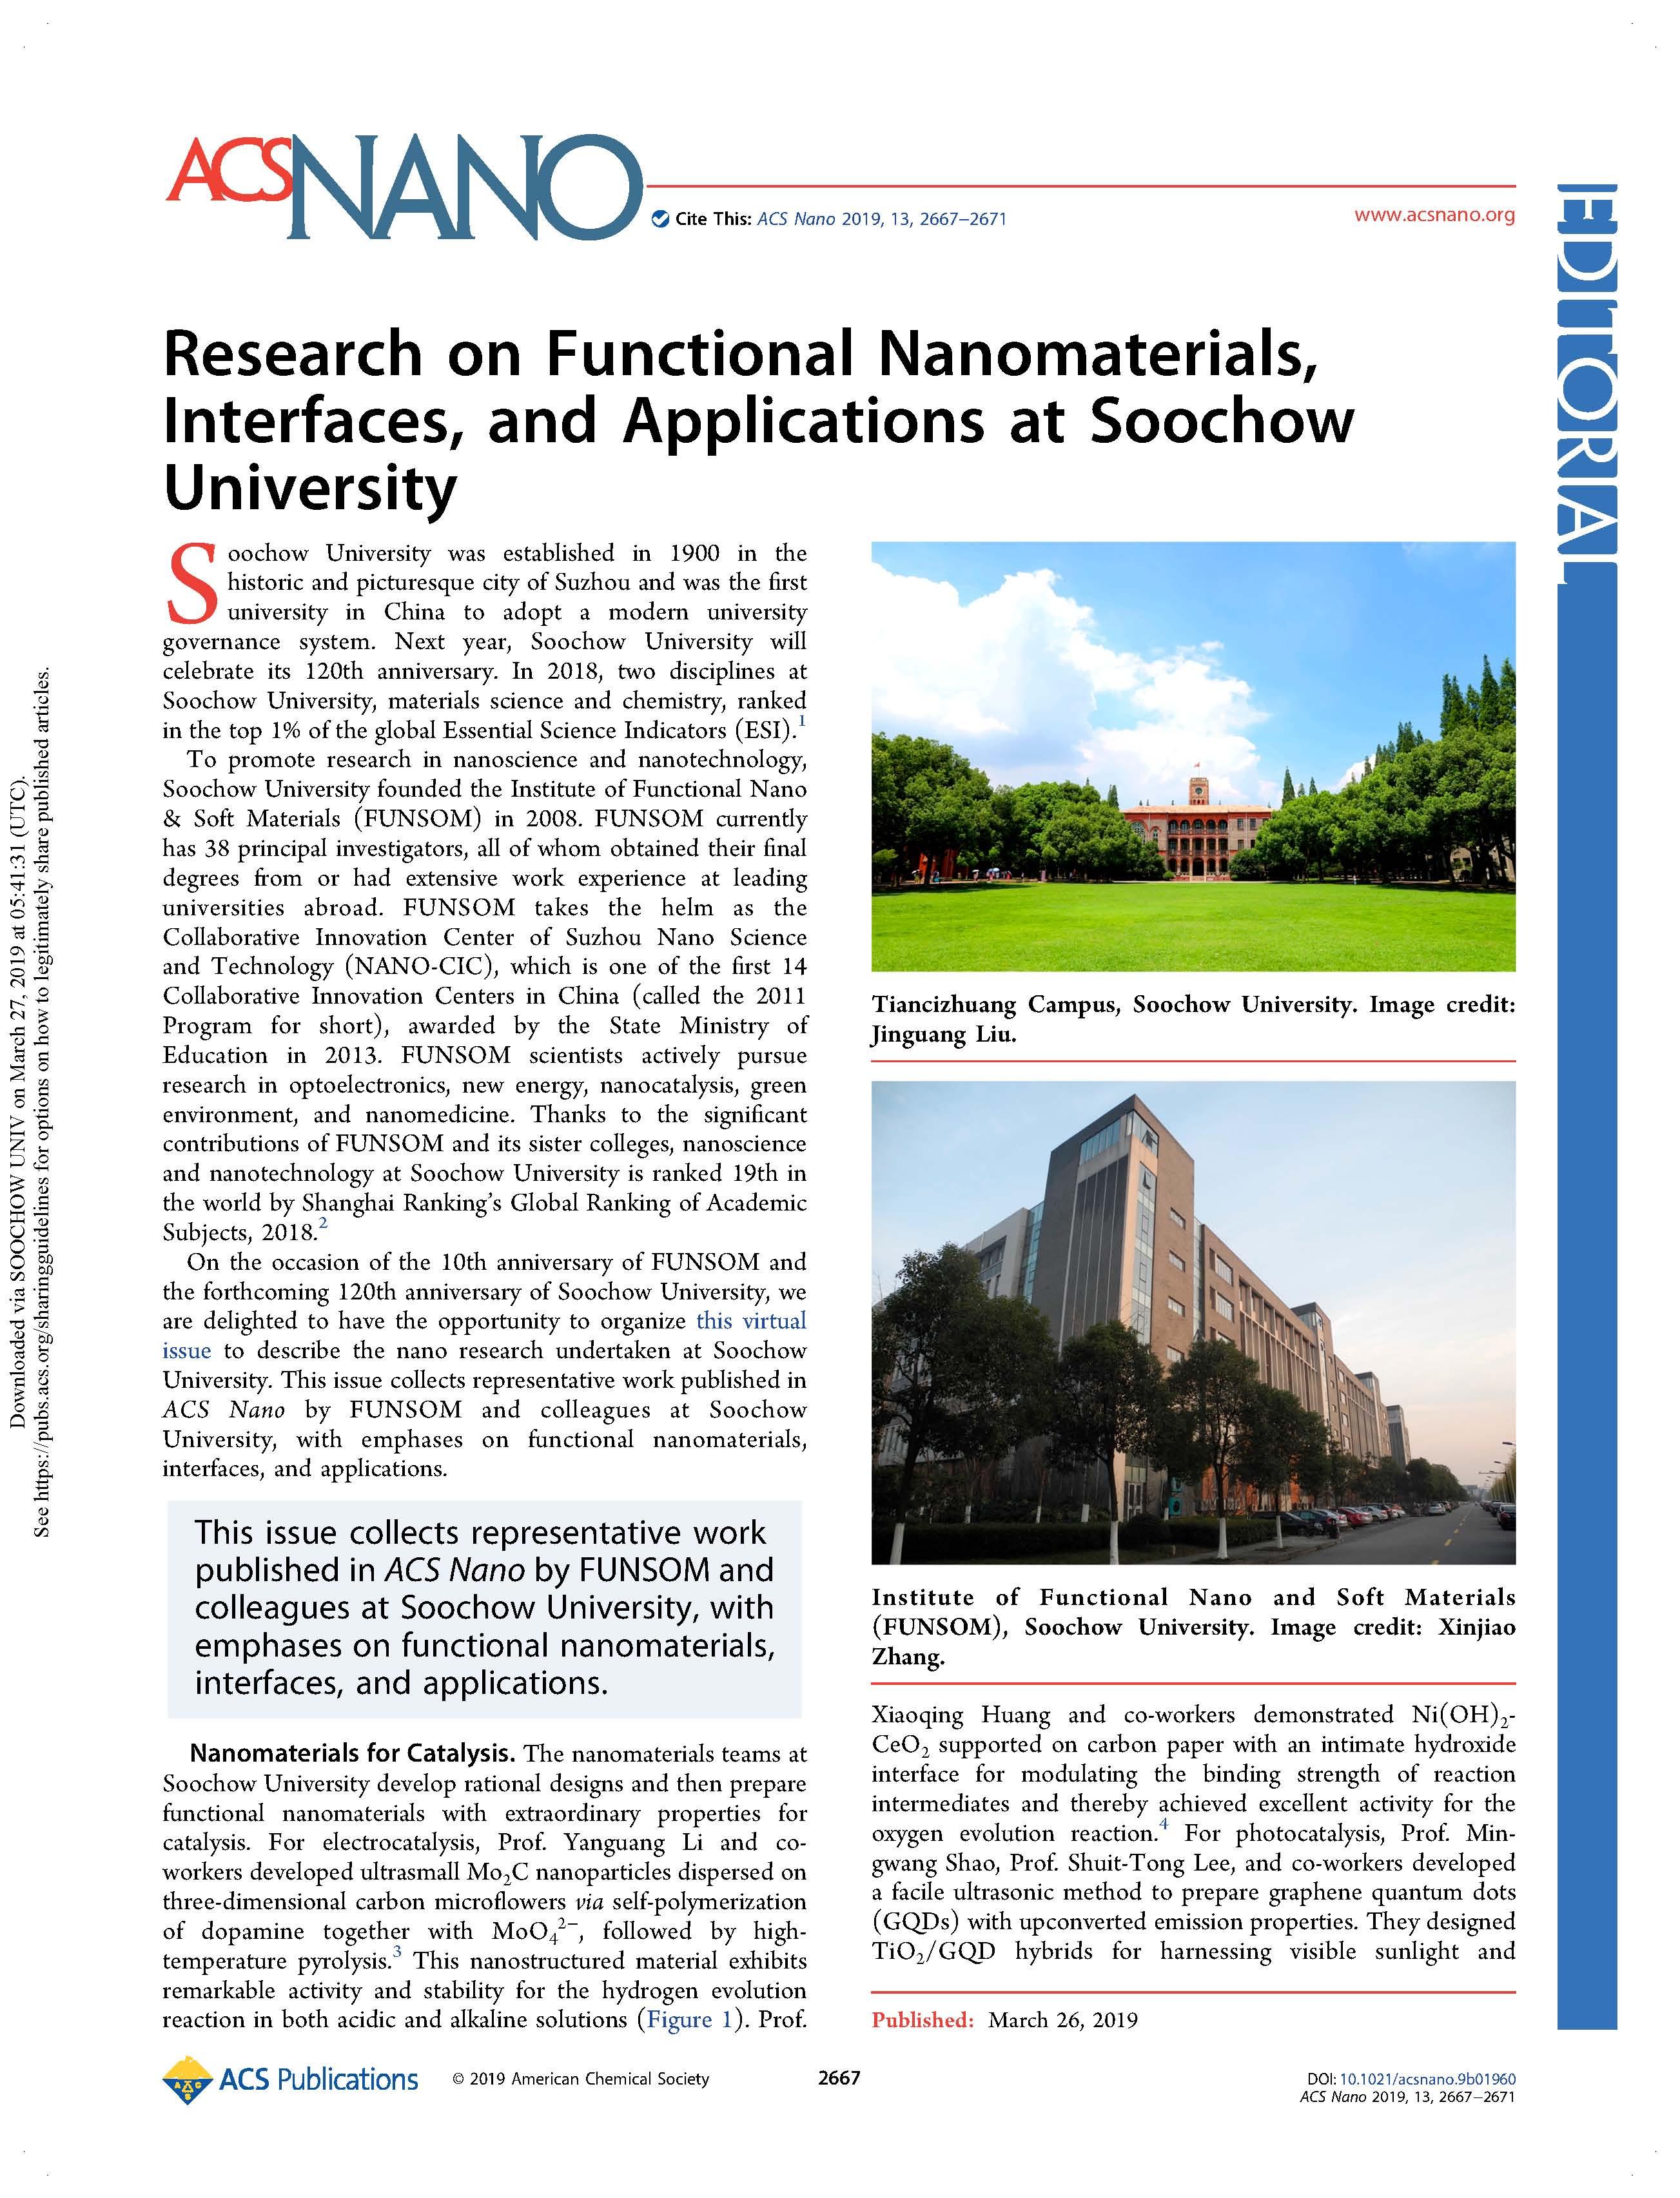 Nanoscience and Nanotechnology Research at Soochow University